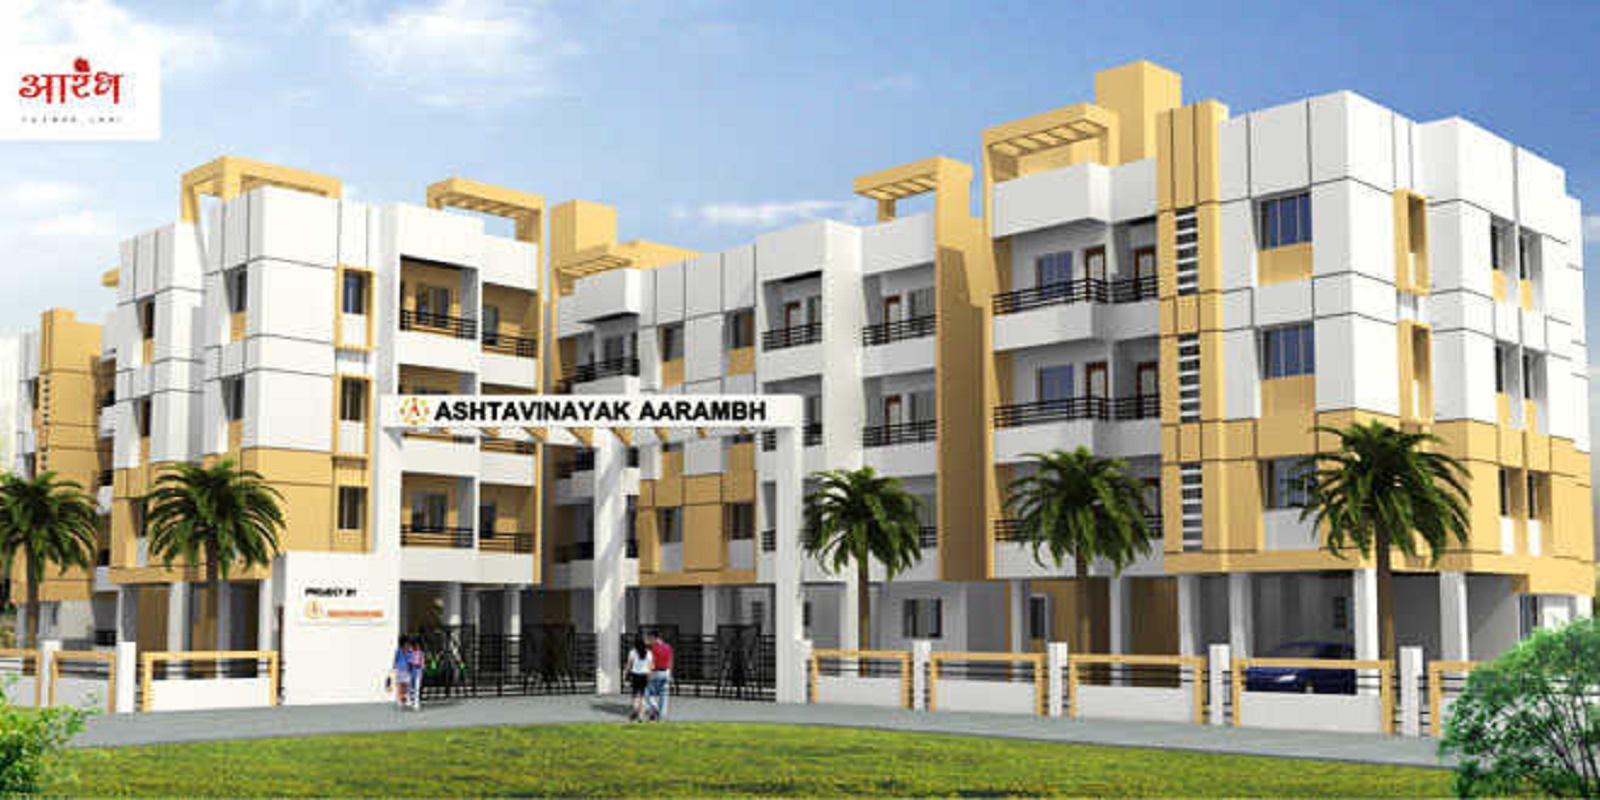 ashtavinayak aarambh apartment project project large image1